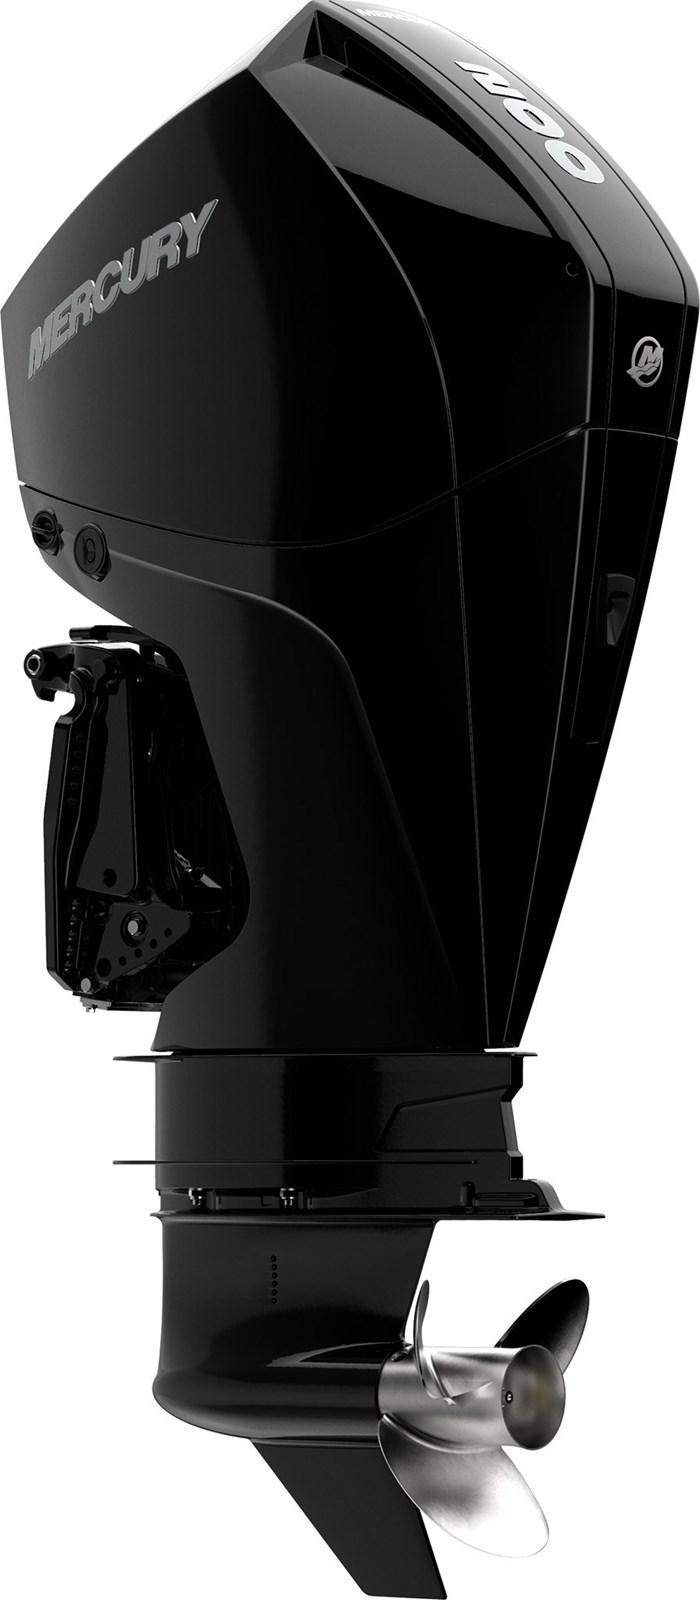 2020 Mercury 200CXL V-6 4-Stroke DTS Photo 8 of 24